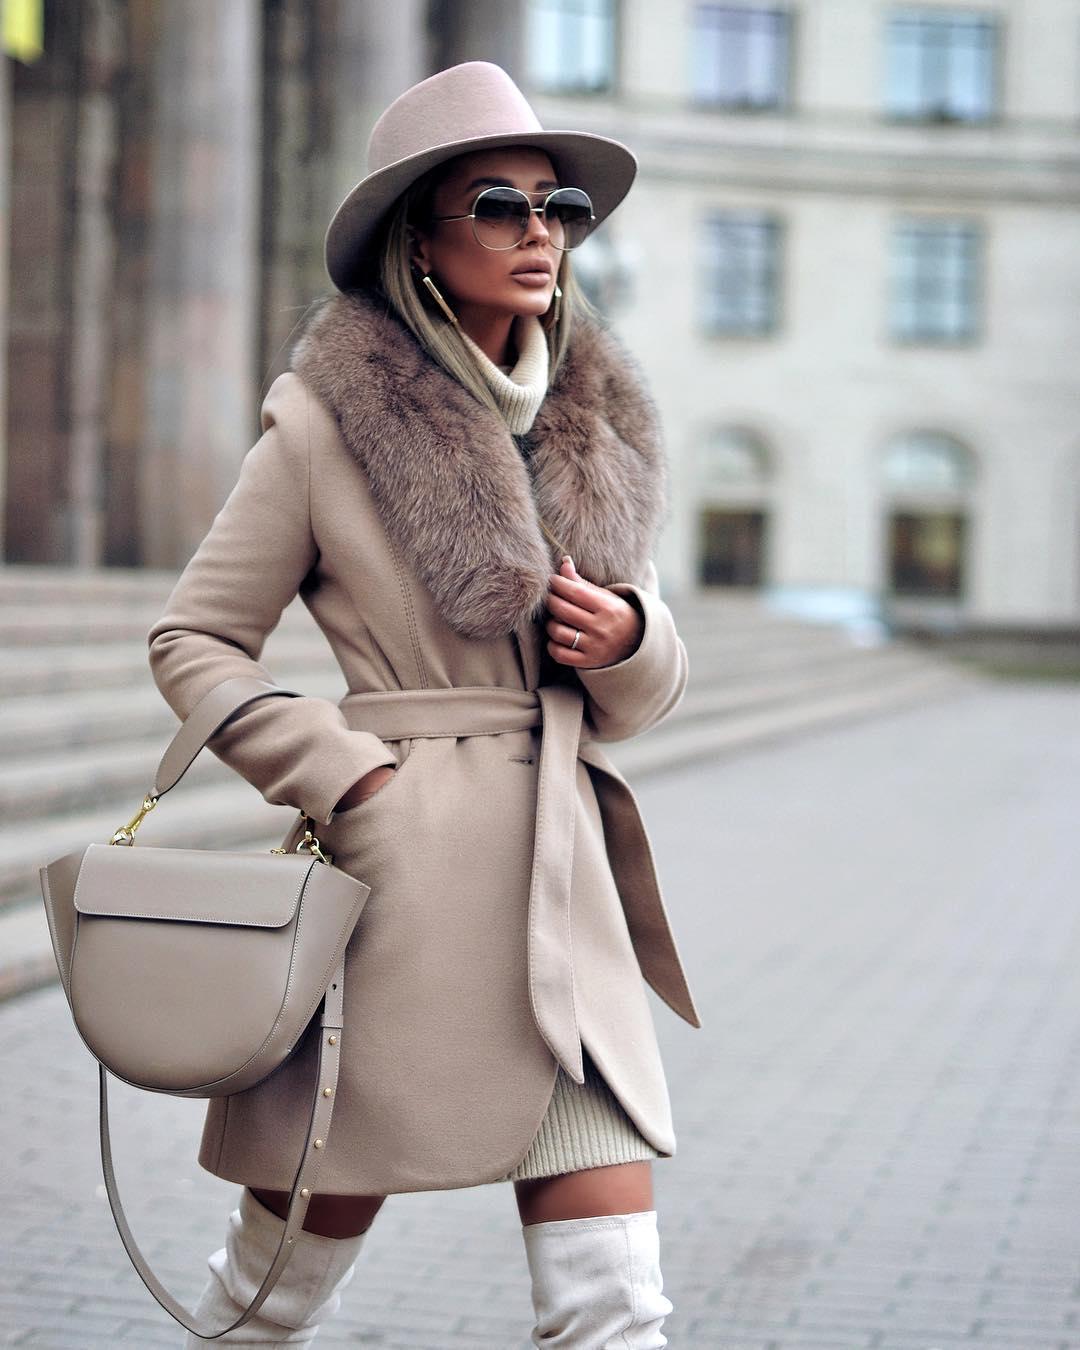 модные луки осень-зима 2019-2020 фото 1